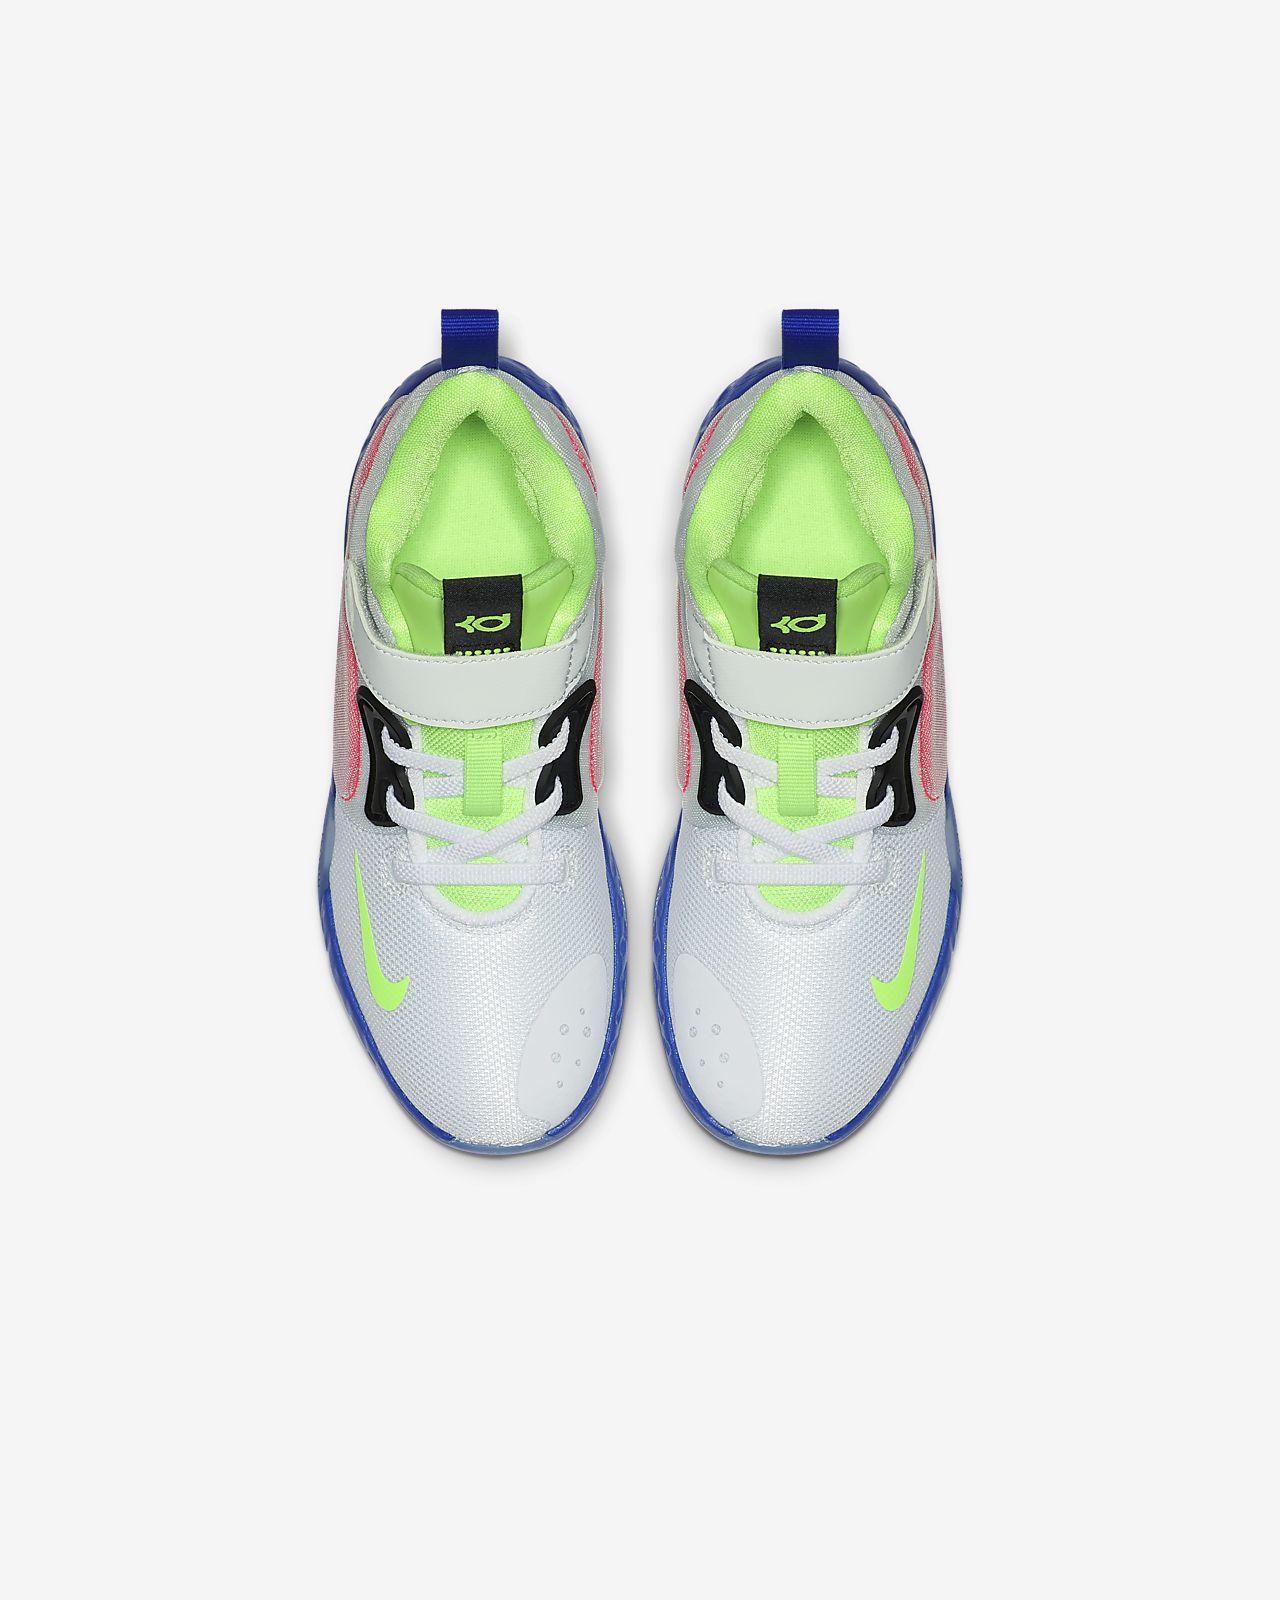 sneakers for cheap 51839 d817a KD Trey 5 VII Little Kids' Shoe